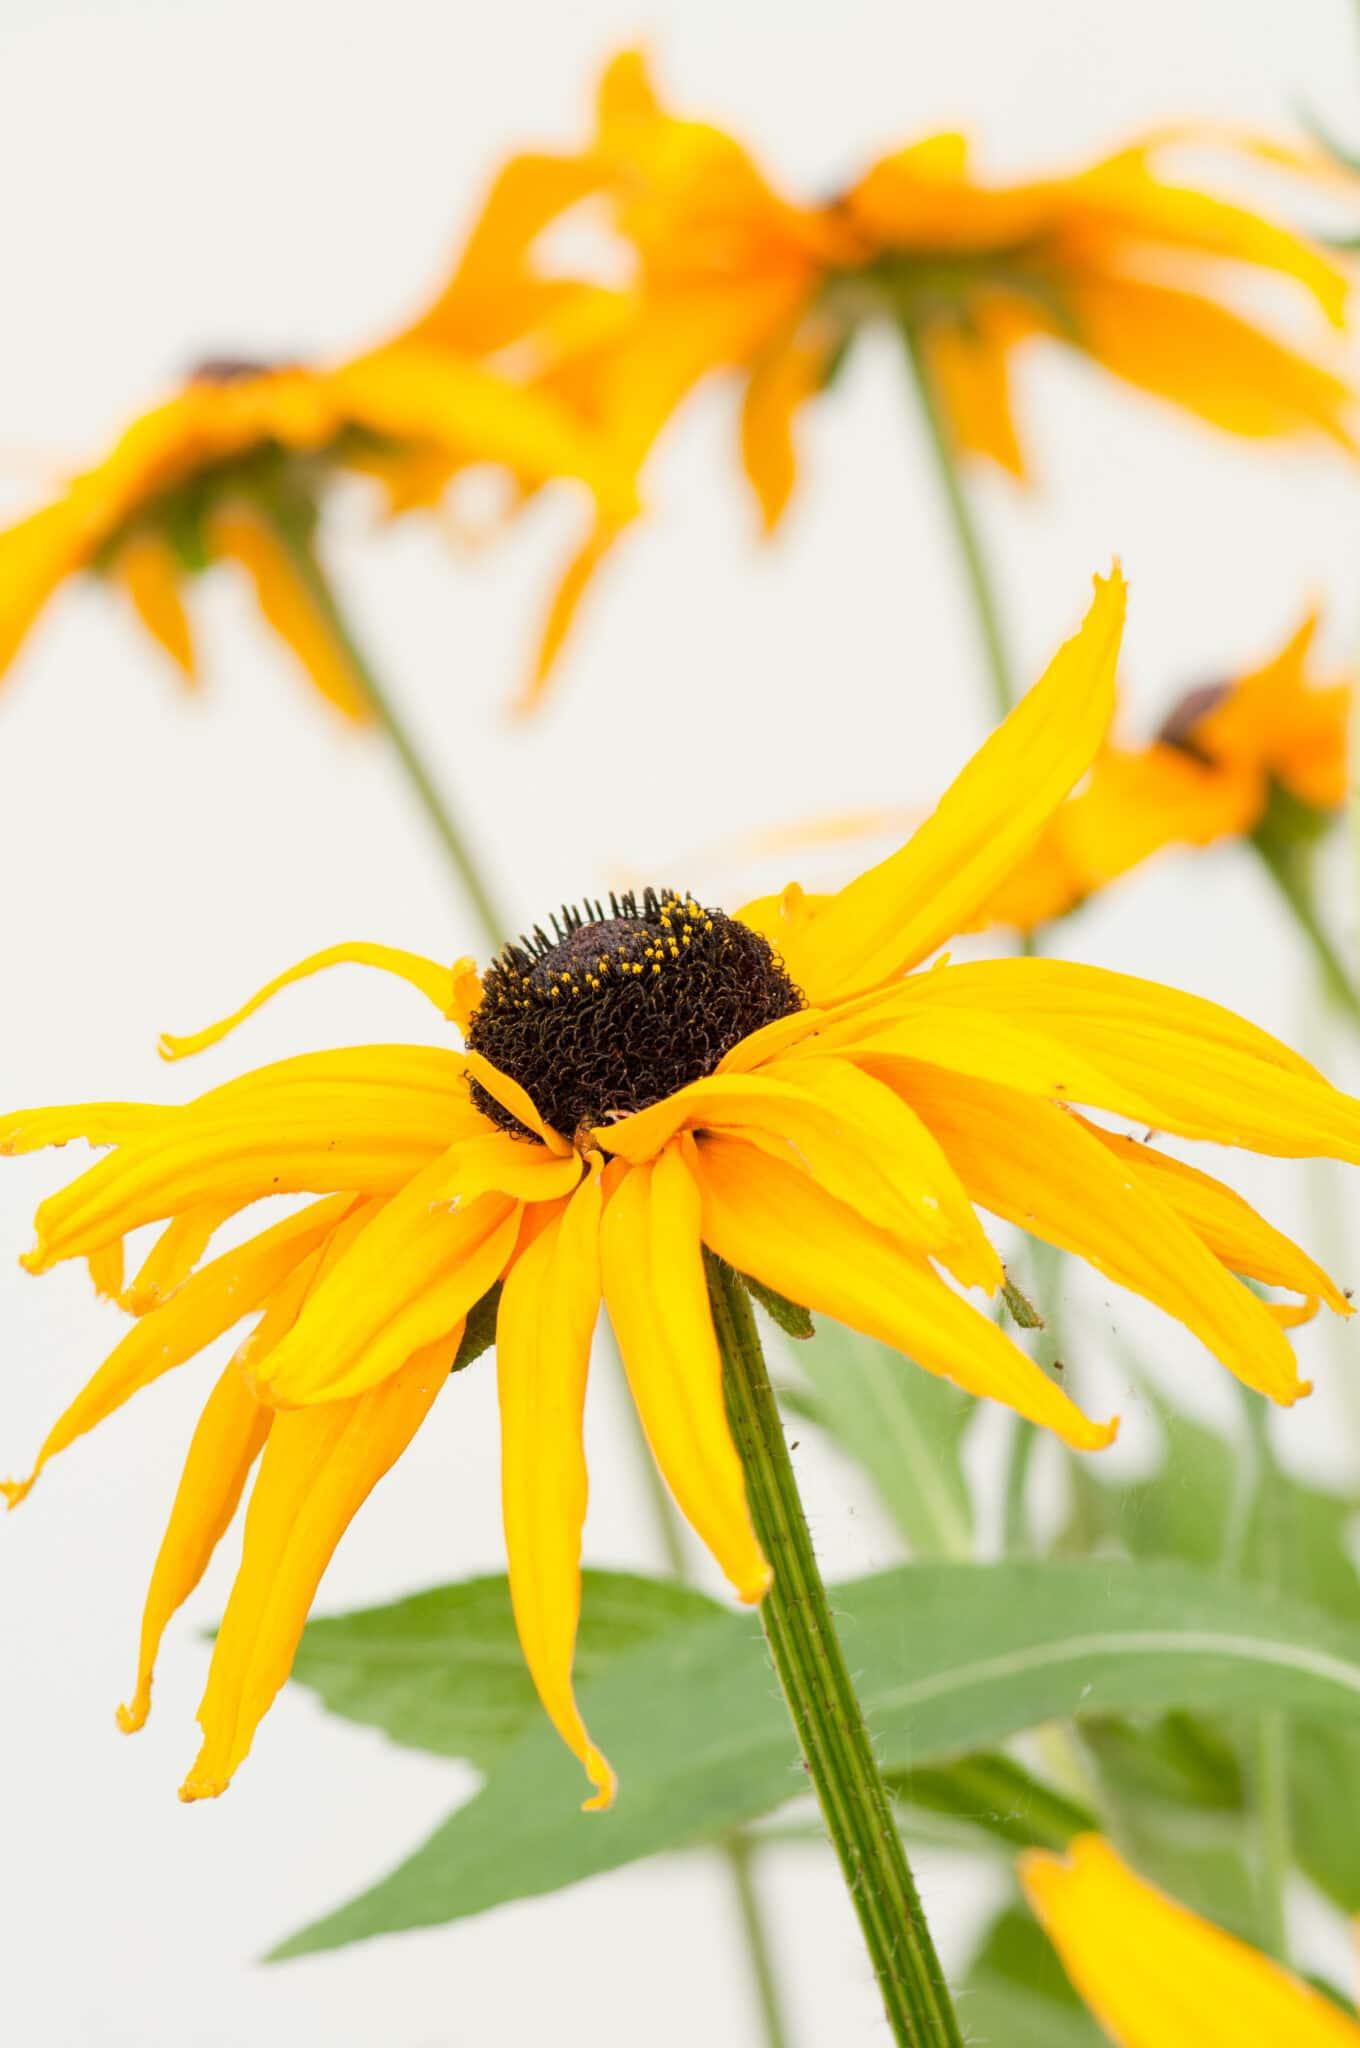 Closeup of a black eyed Susan flower in bloom